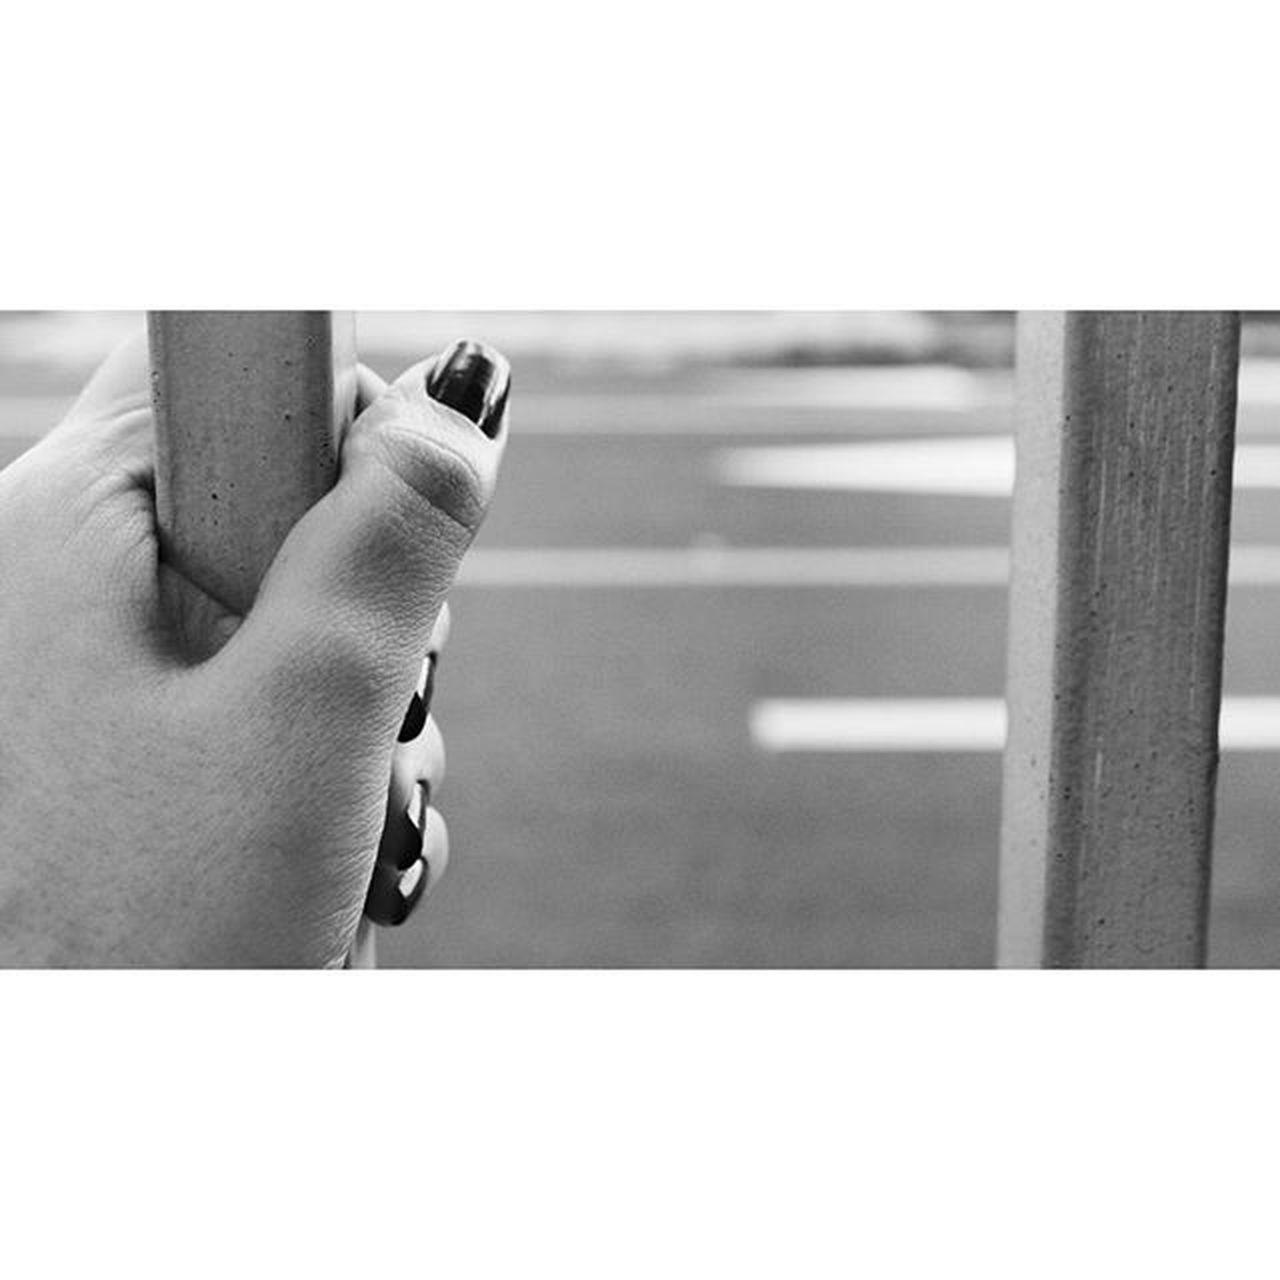 Photo Fotografia Foto Photographer Blackandwhite Nails Photography Brasildosmeusolhos_